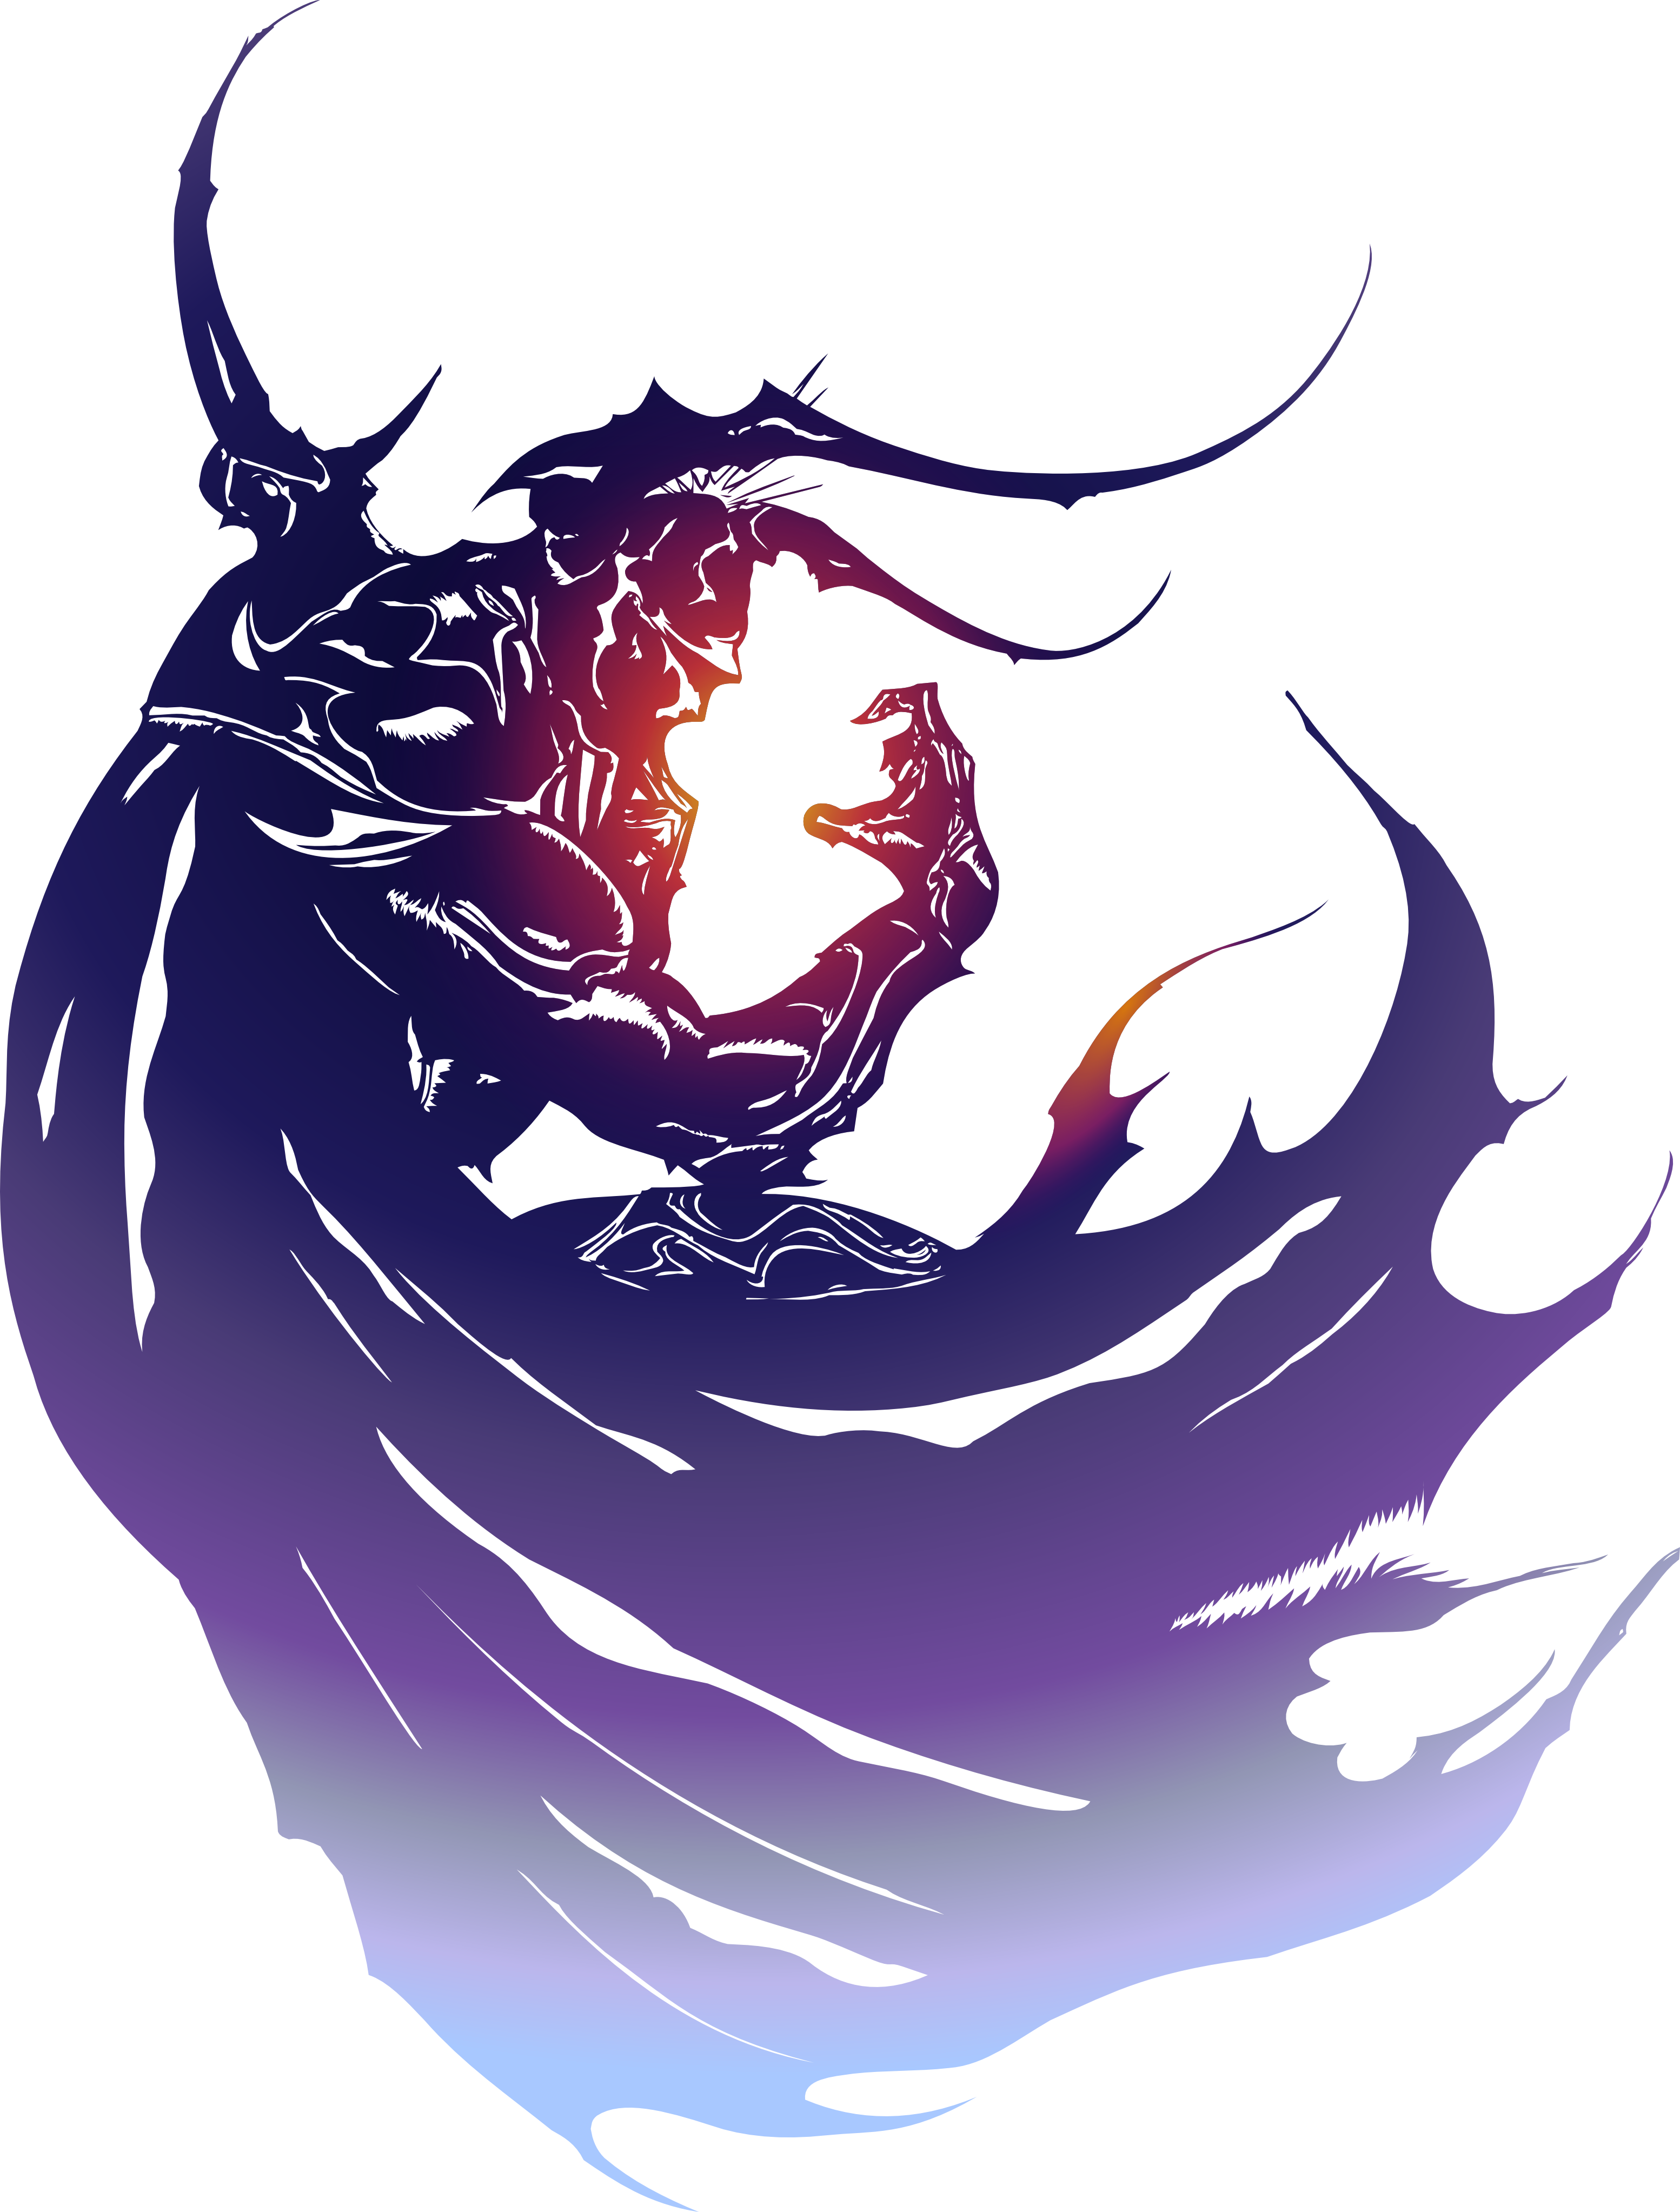 Final fantasy xii logo png - photo#22